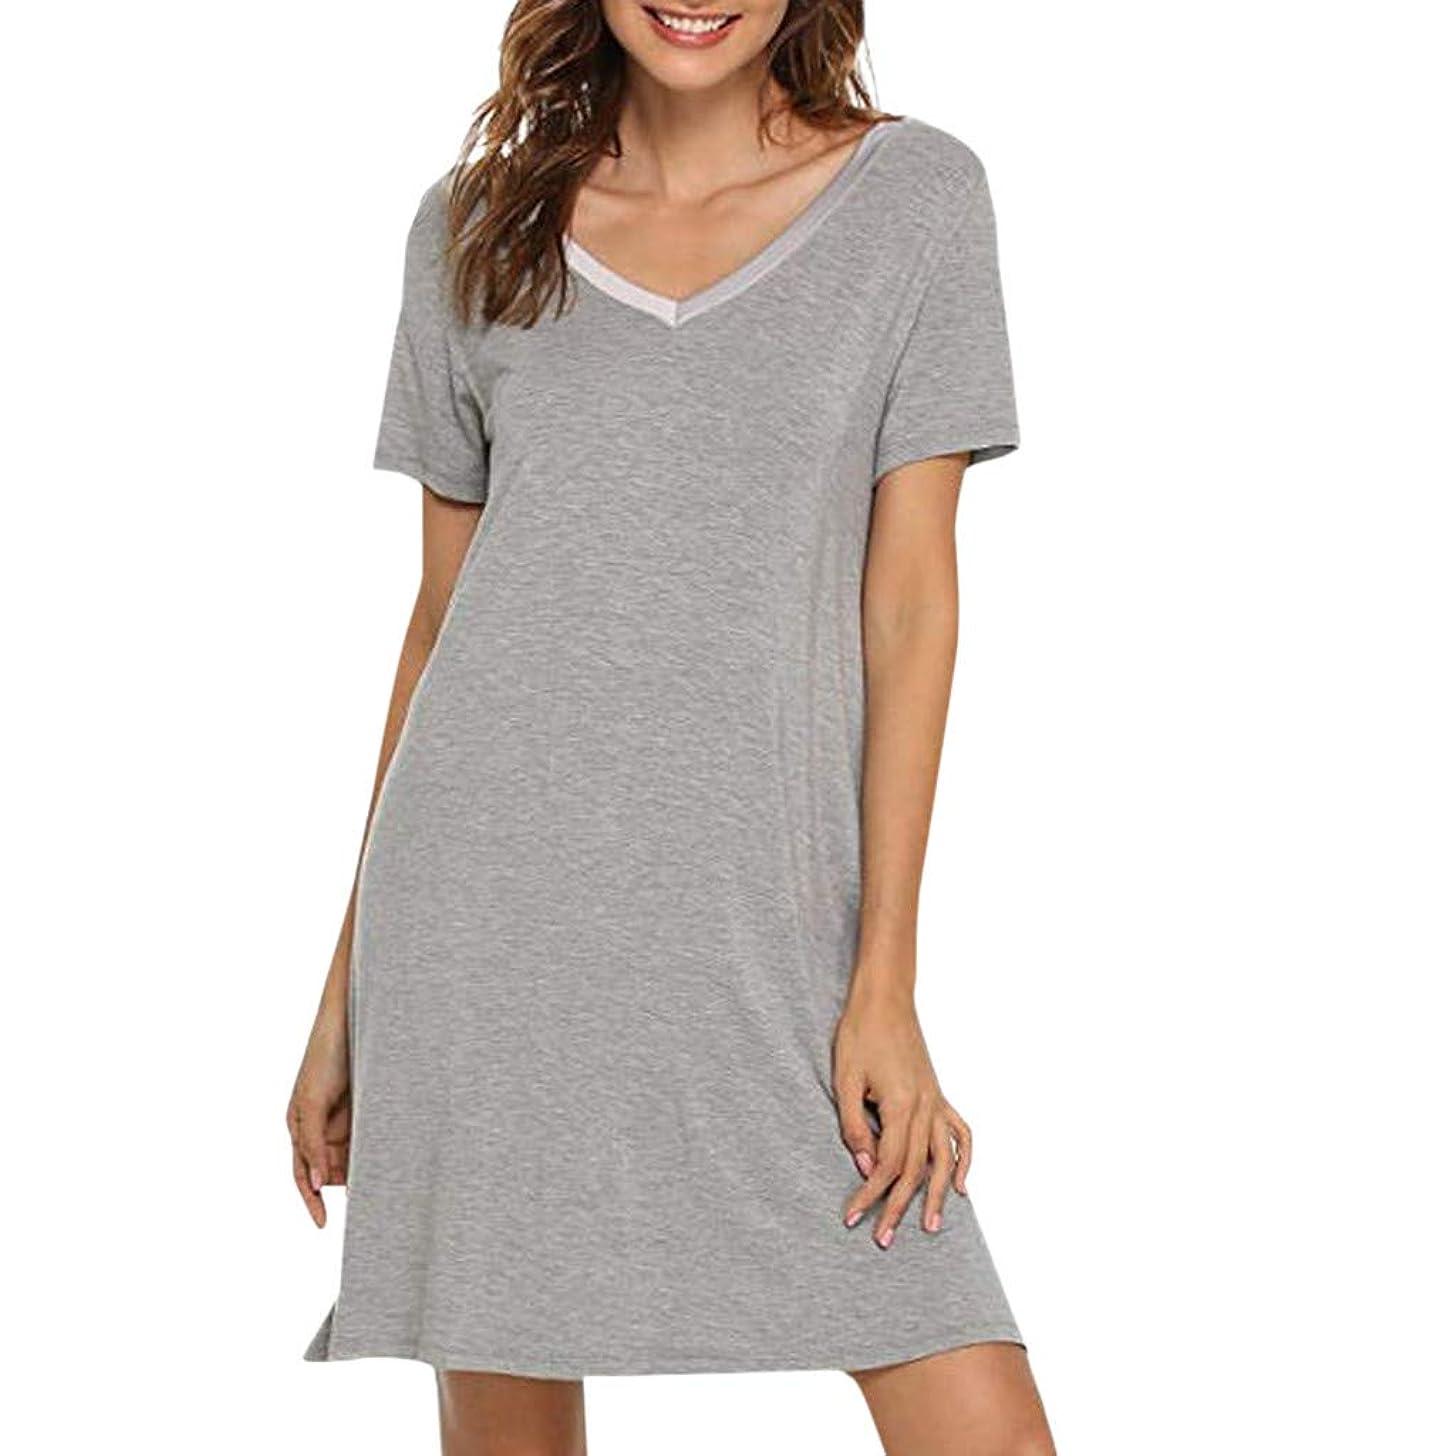 Women's Nightgown Casual Sleep Shirt V Neck Short Sleeve Loose Pajama Dress Sleepwear